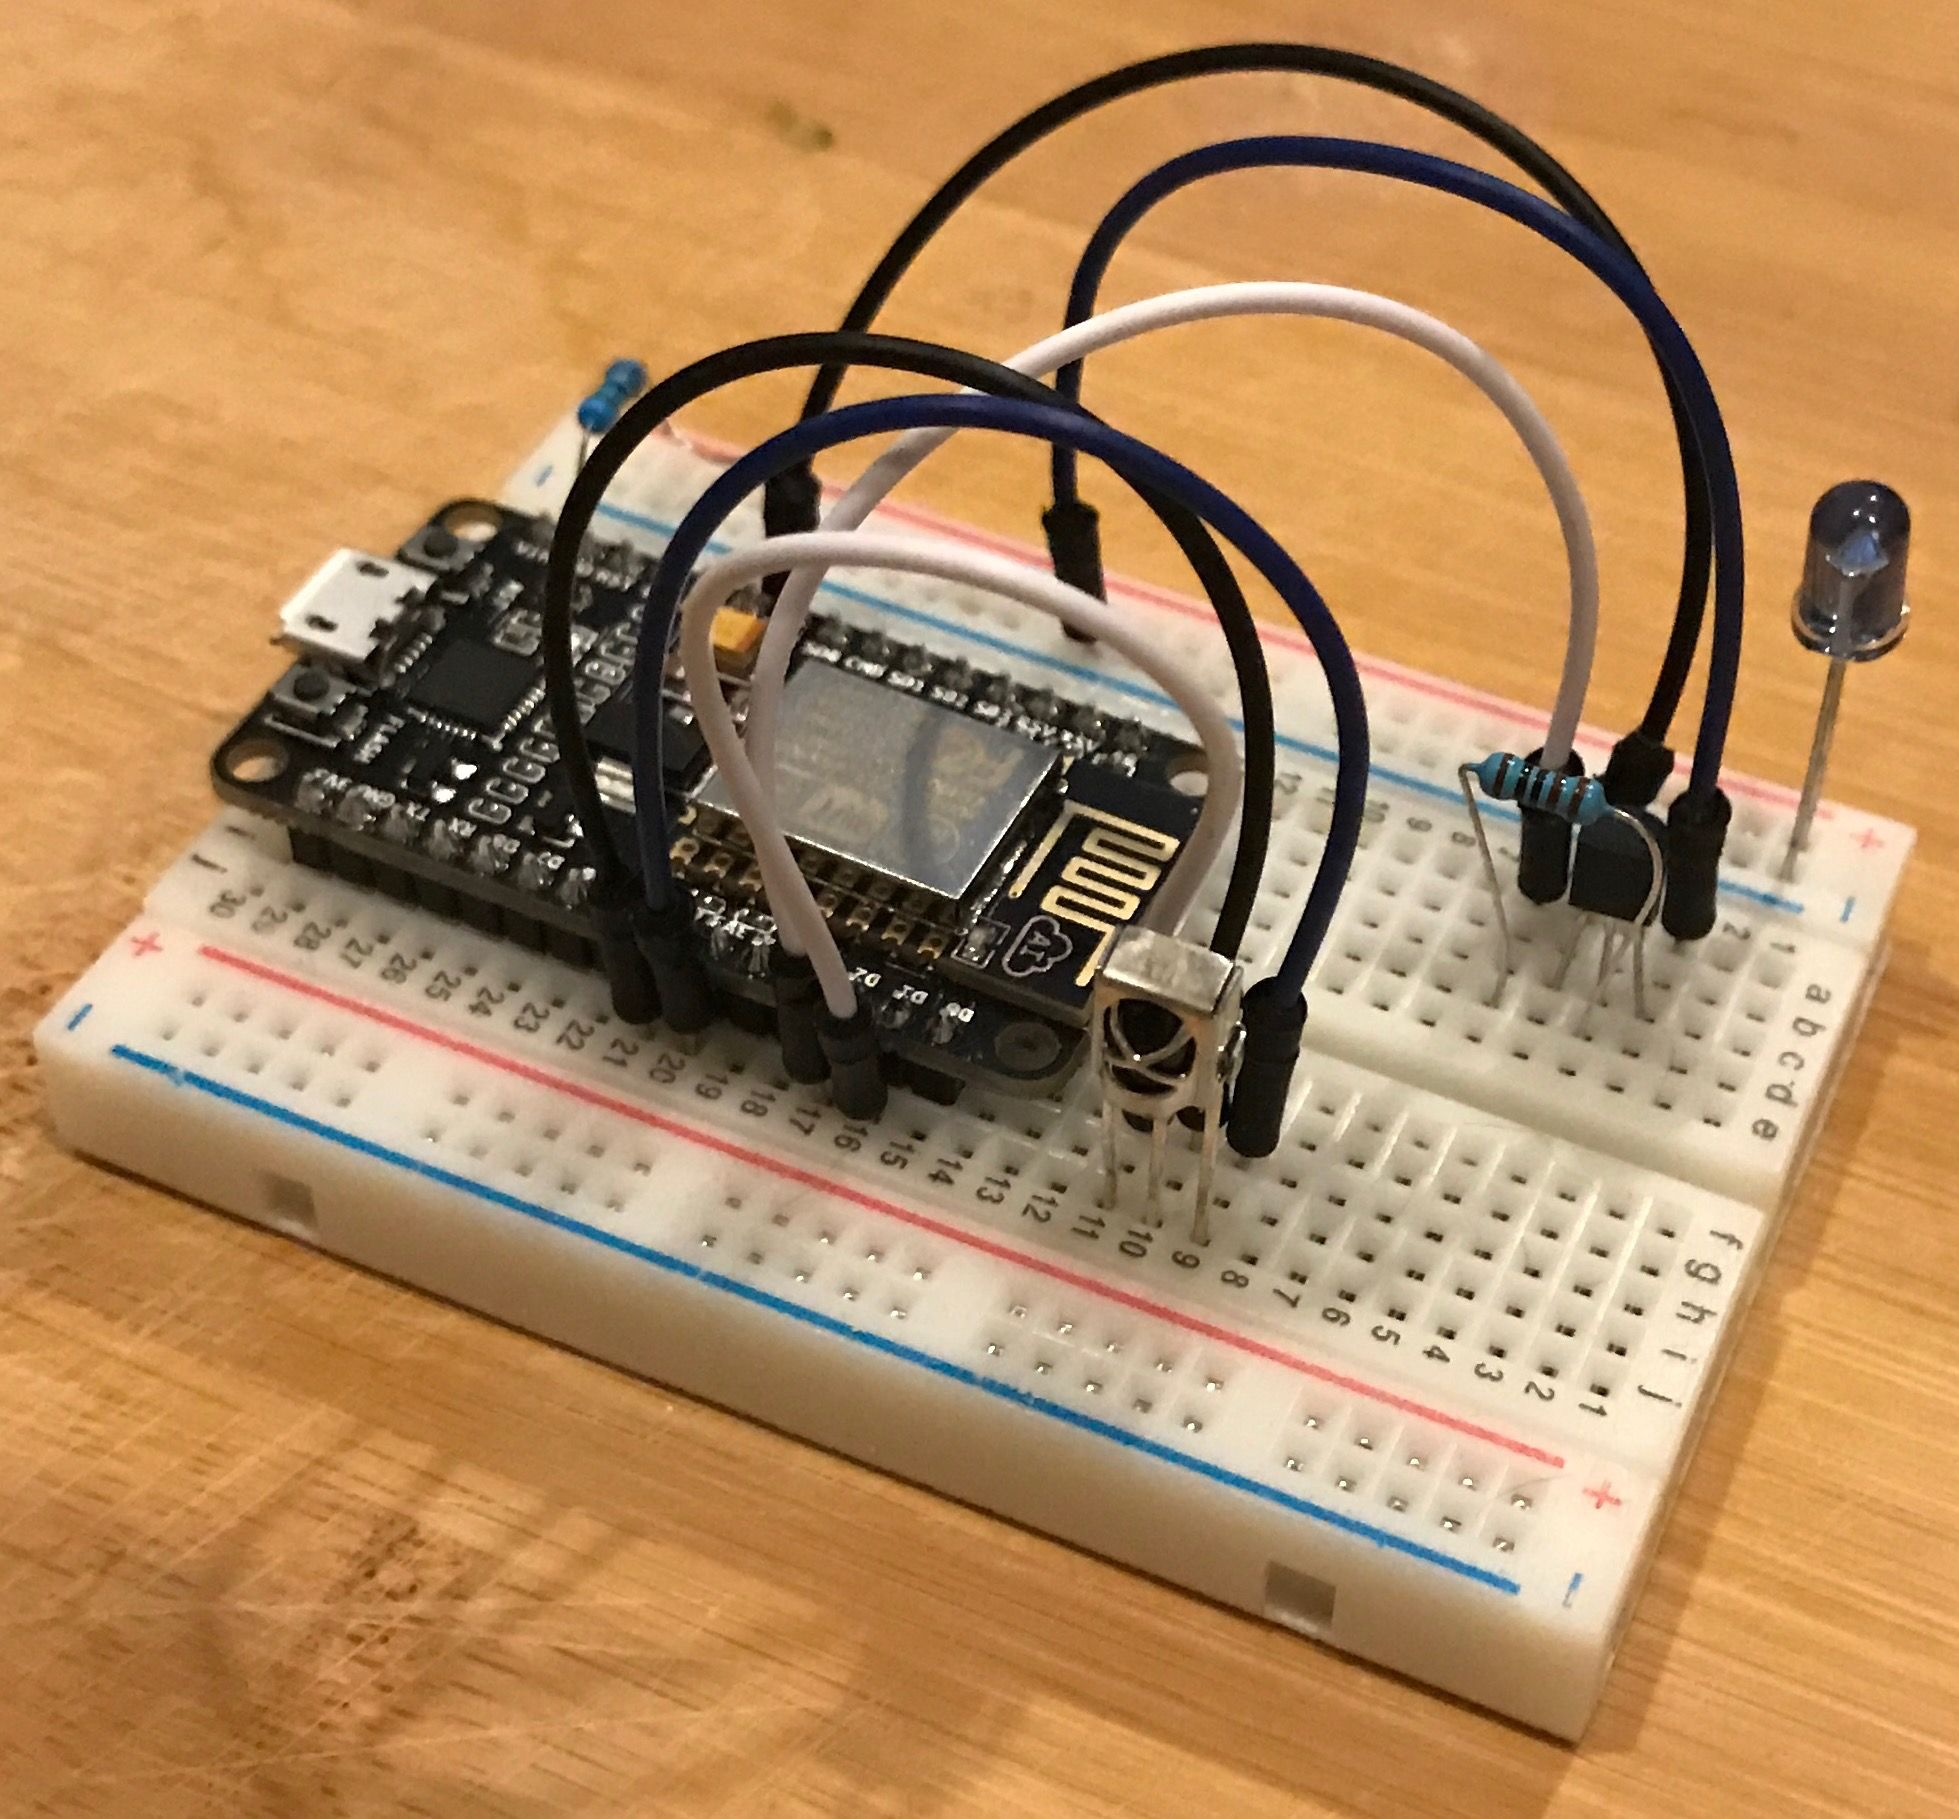 esp8266 ir blaster using arduino ido and accepting alexa input [ 1959 x 1819 Pixel ]